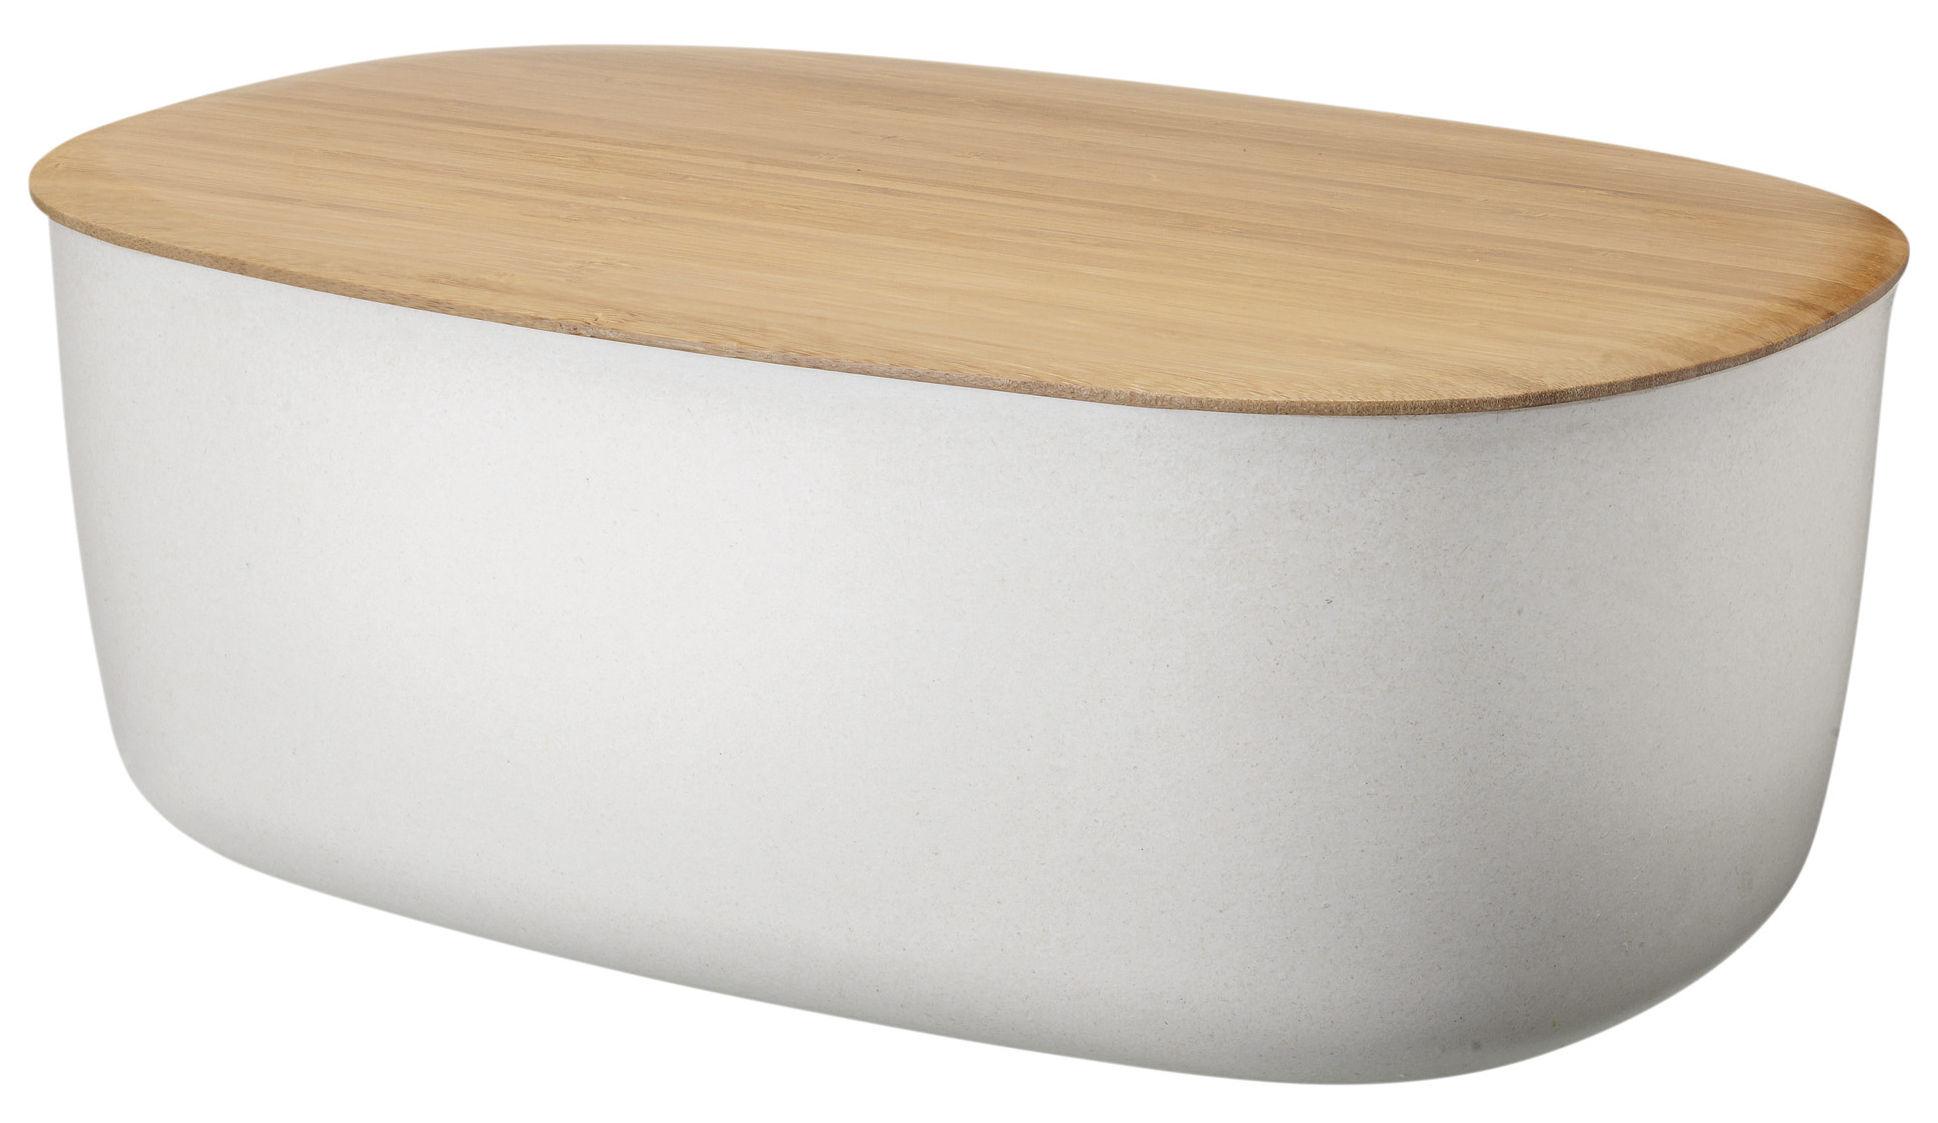 bo te pain stelton blanc bois l 34 5 x l 22 7 x h. Black Bedroom Furniture Sets. Home Design Ideas